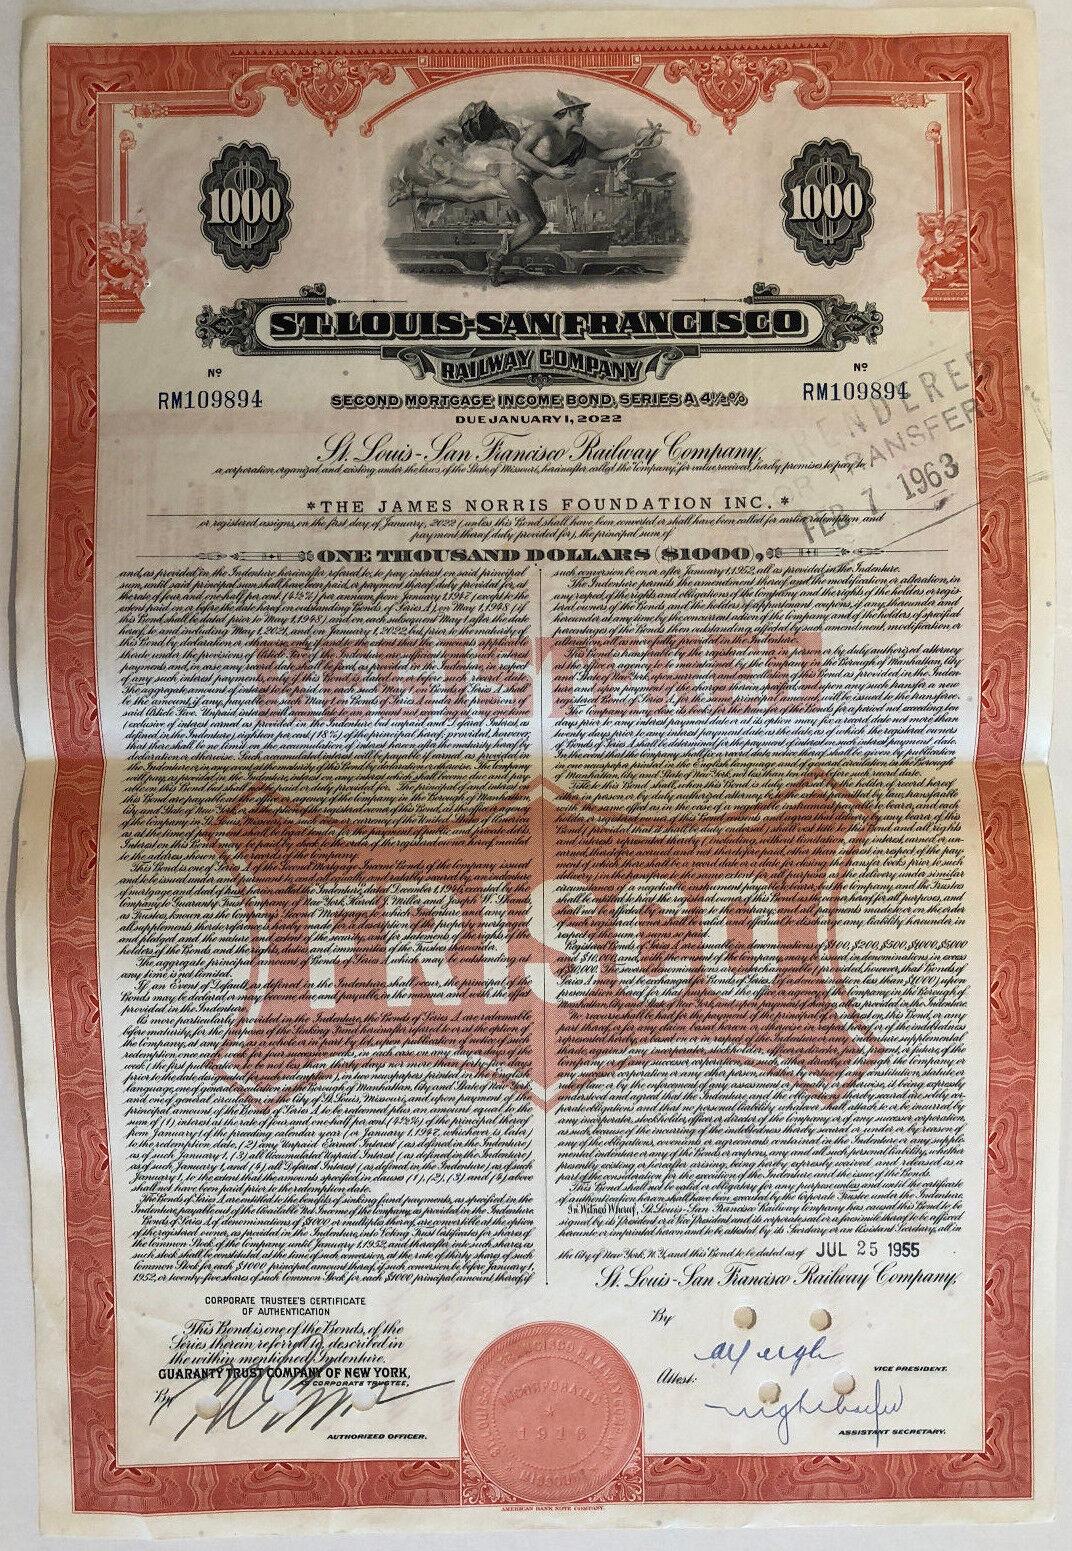 St Louis - San Francisco Railway Company > 1950s FRISCO bond certificate